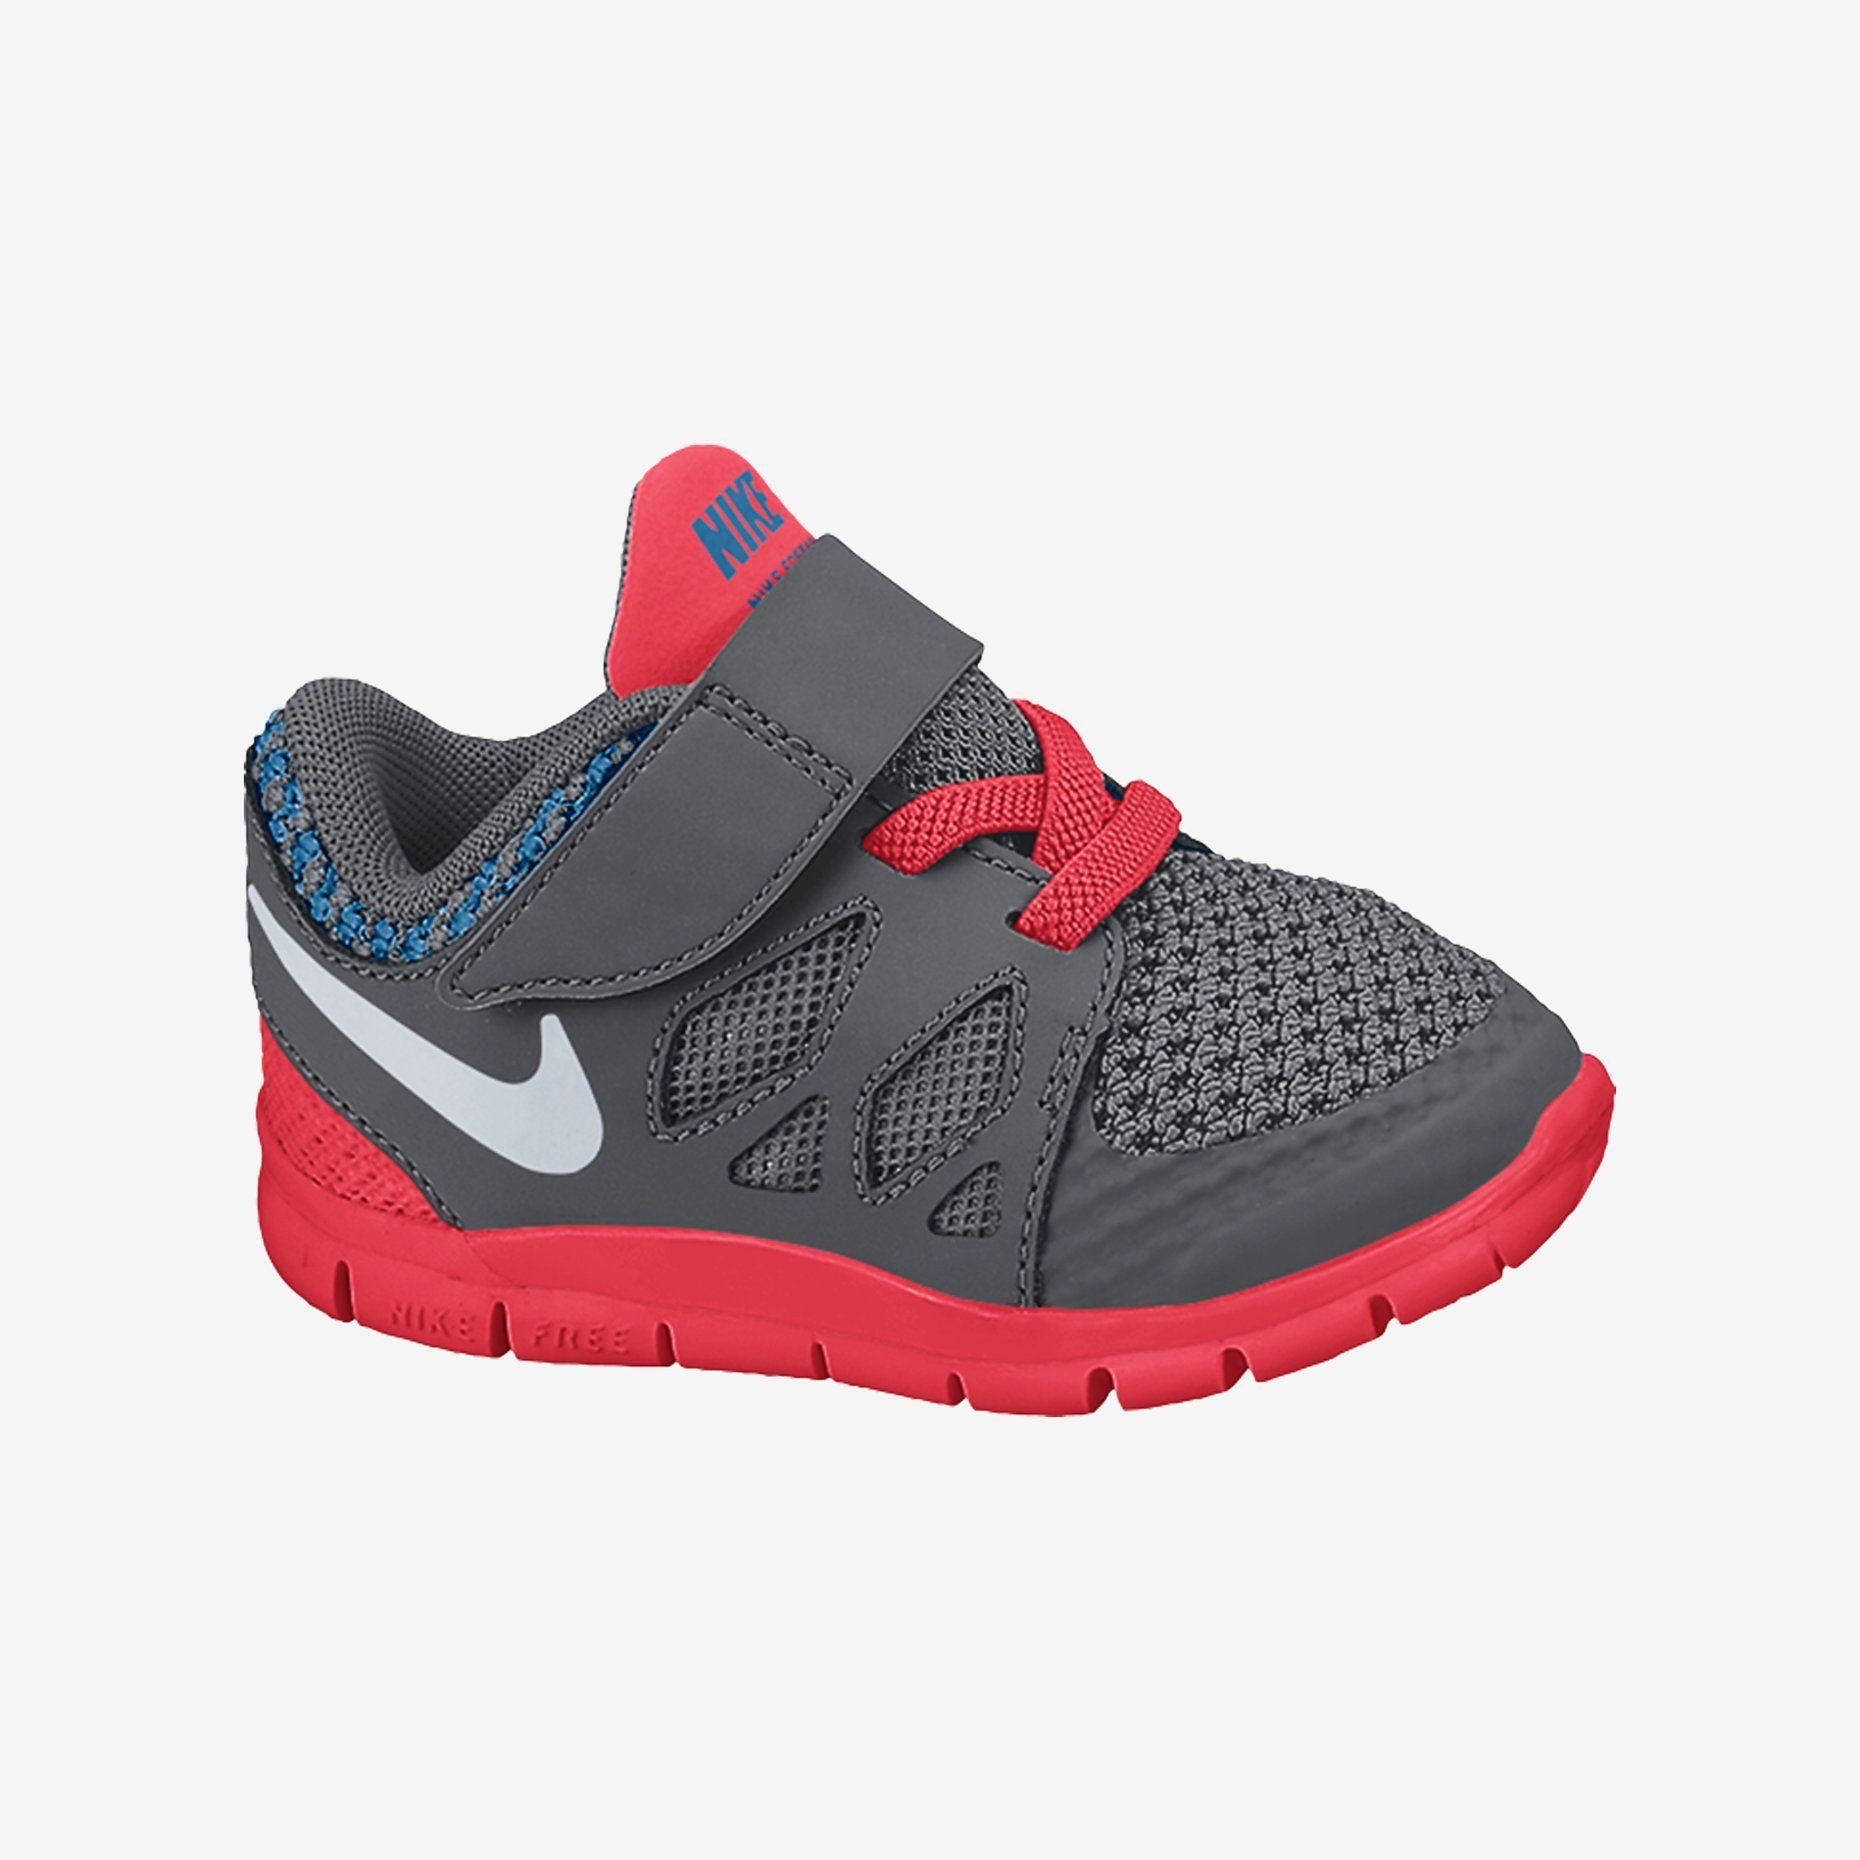 Nike Chaussures Gratuit 5,0 Garçons Tout-petits